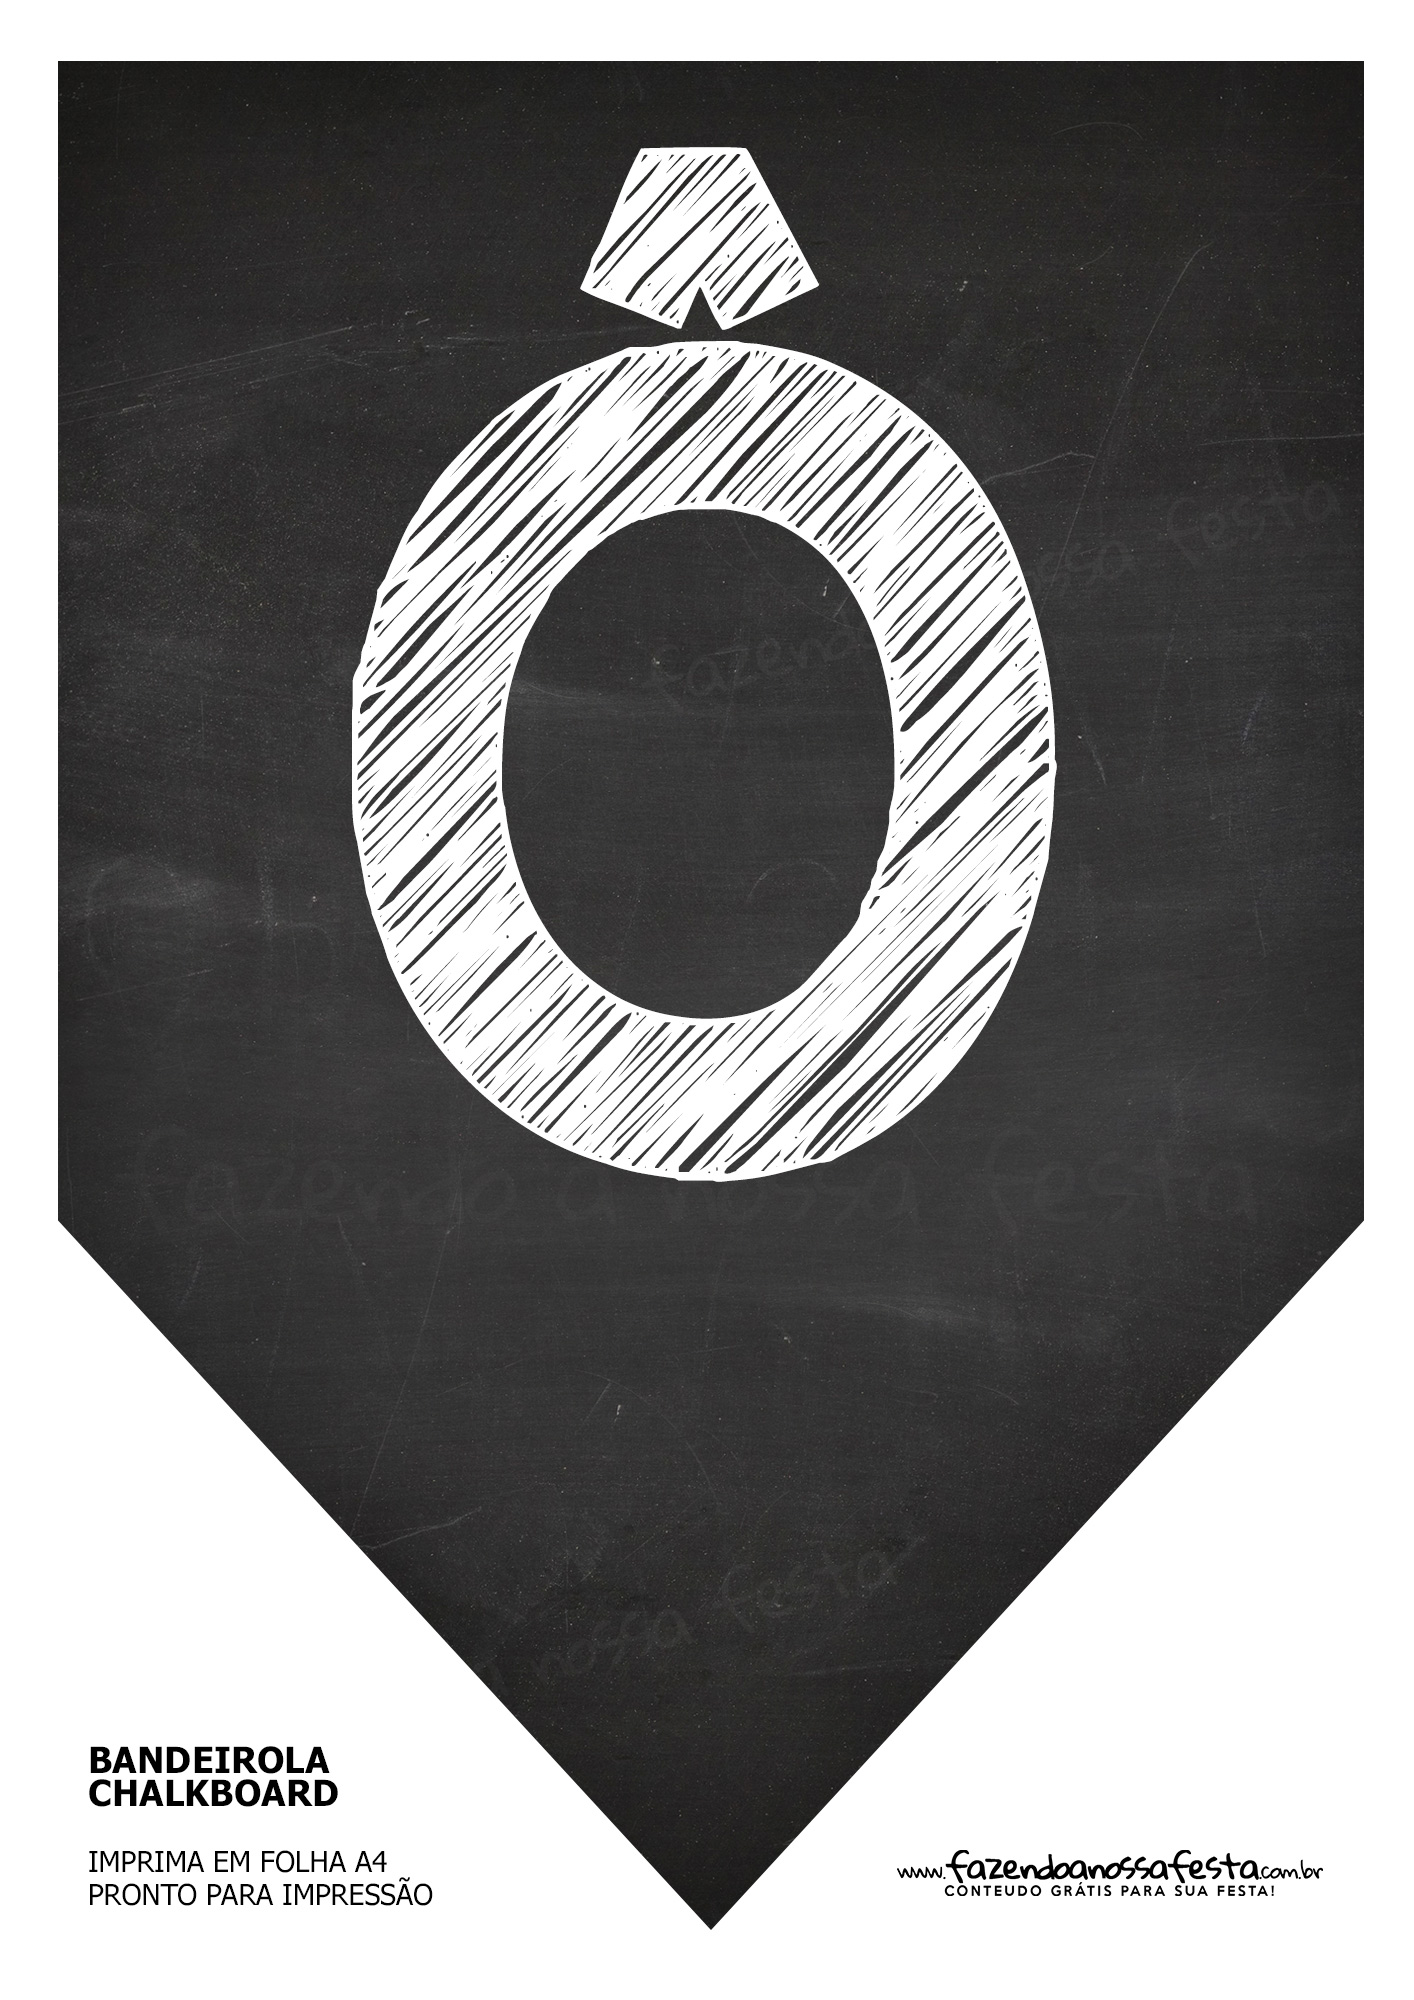 Bandeirinha Chalkboard ô